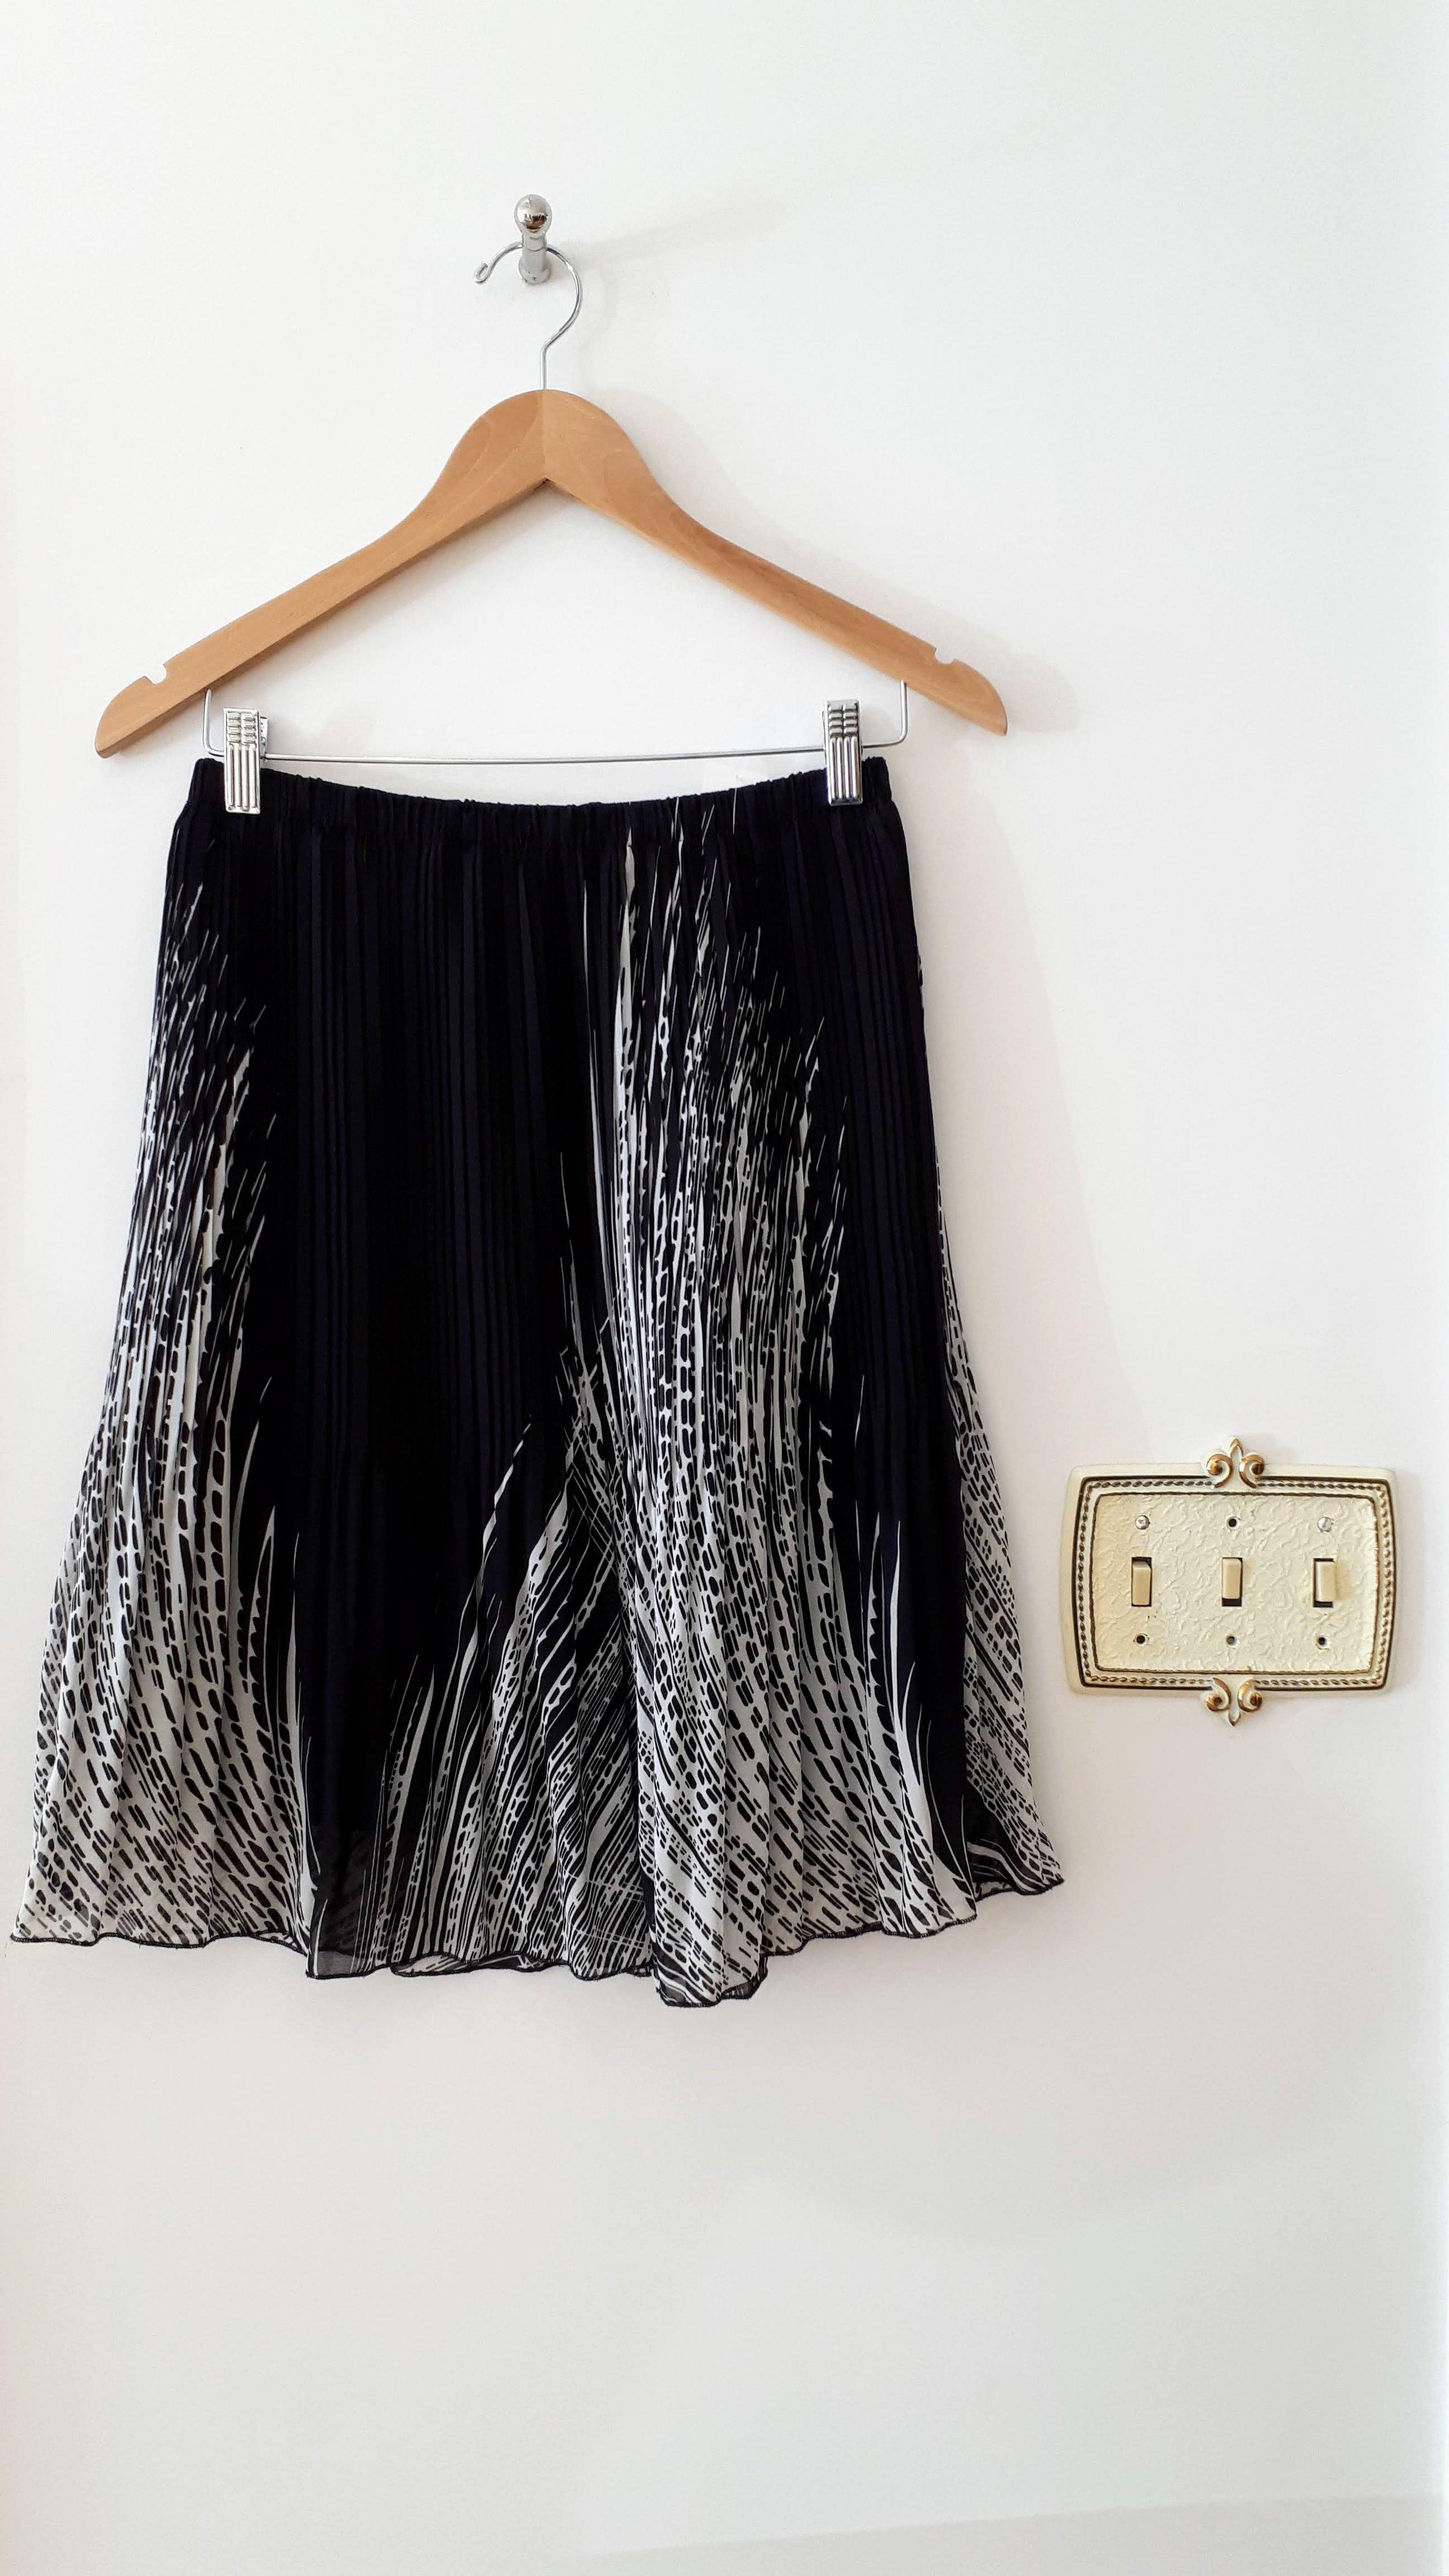 Kenar skirt; Size M, $20